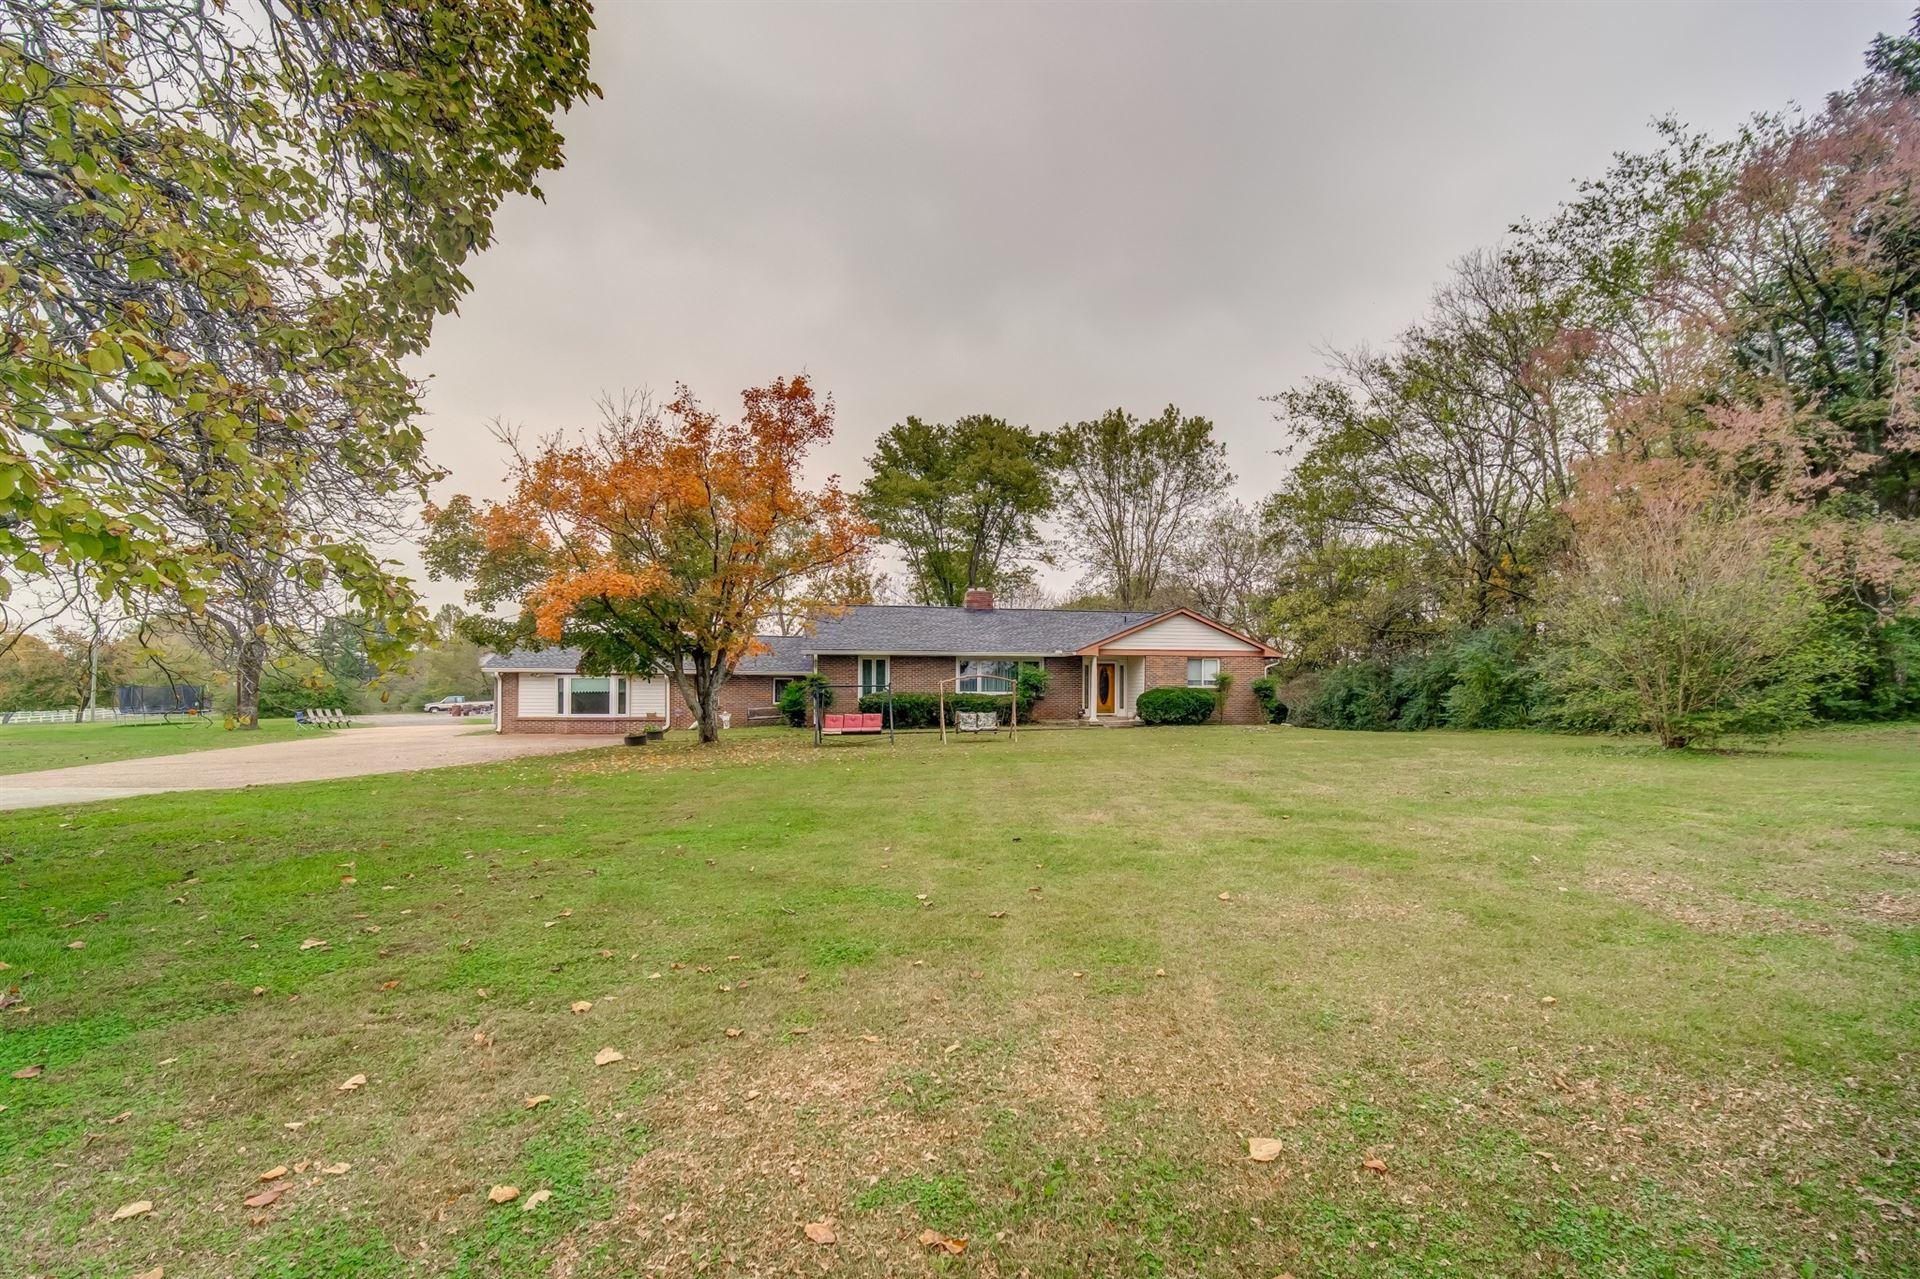 Photo of 4302 Arno Rd, Franklin, TN 37064 (MLS # 2199770)